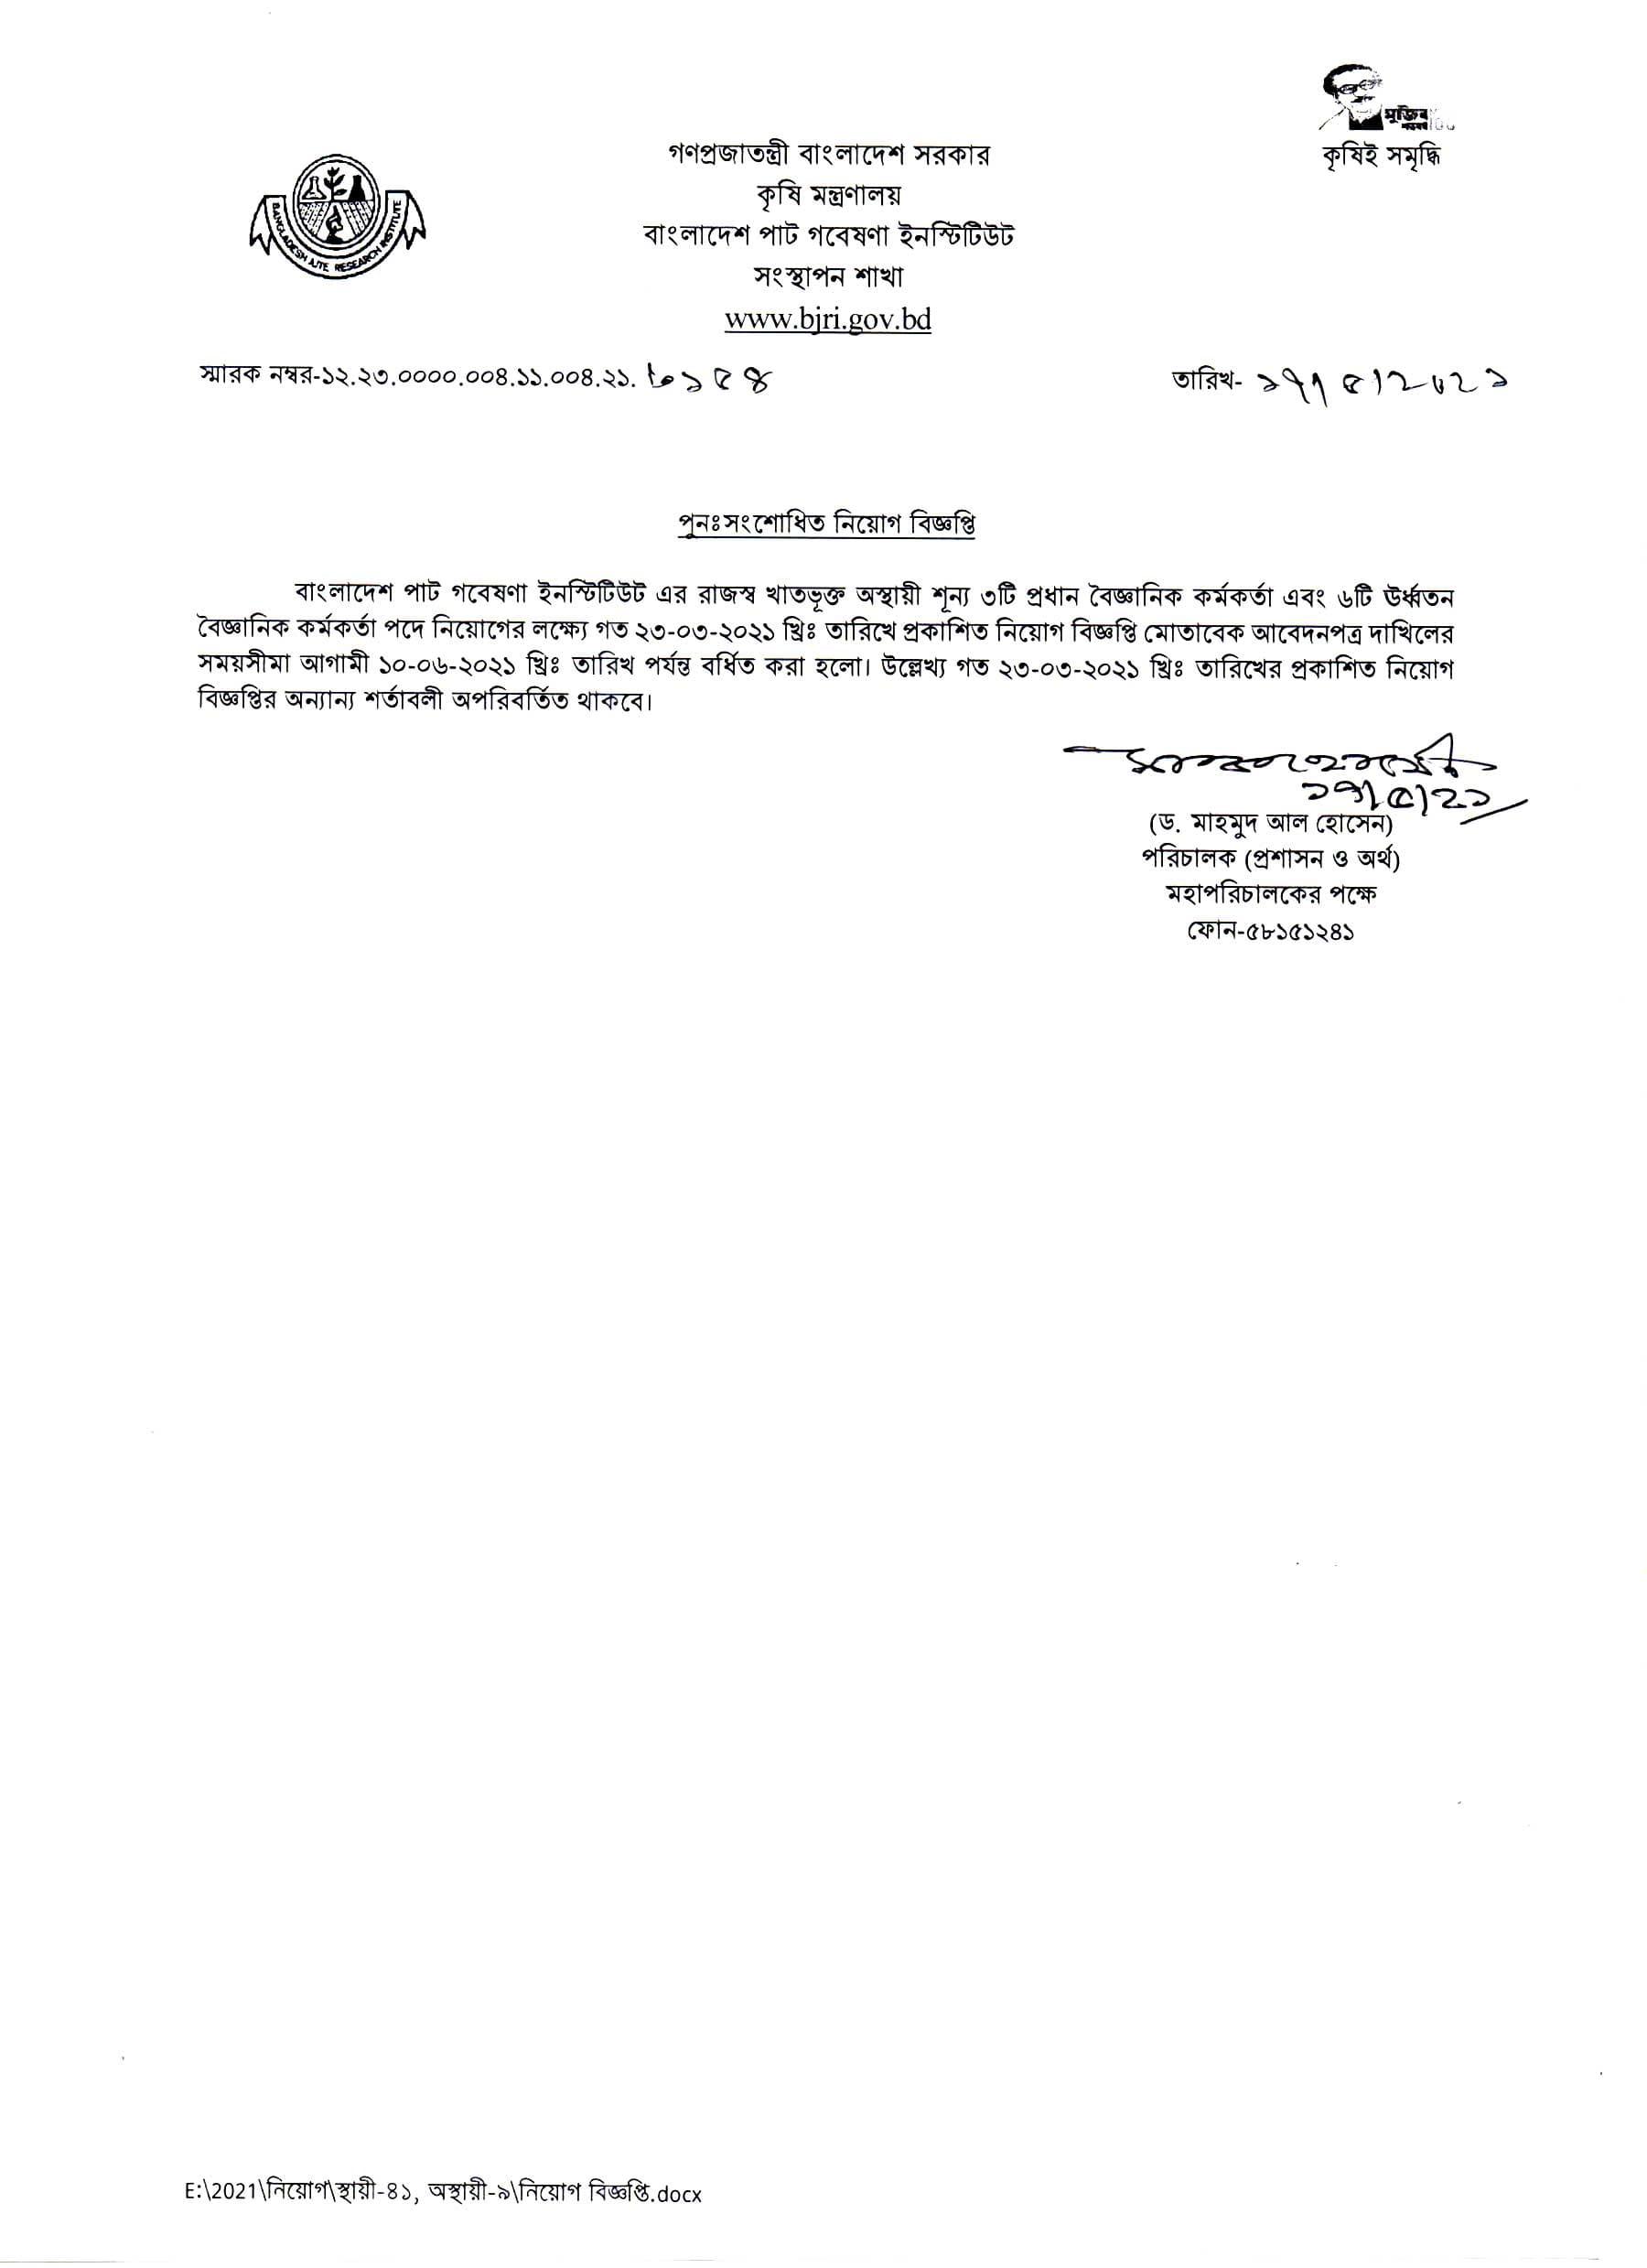 bjri job circular notice